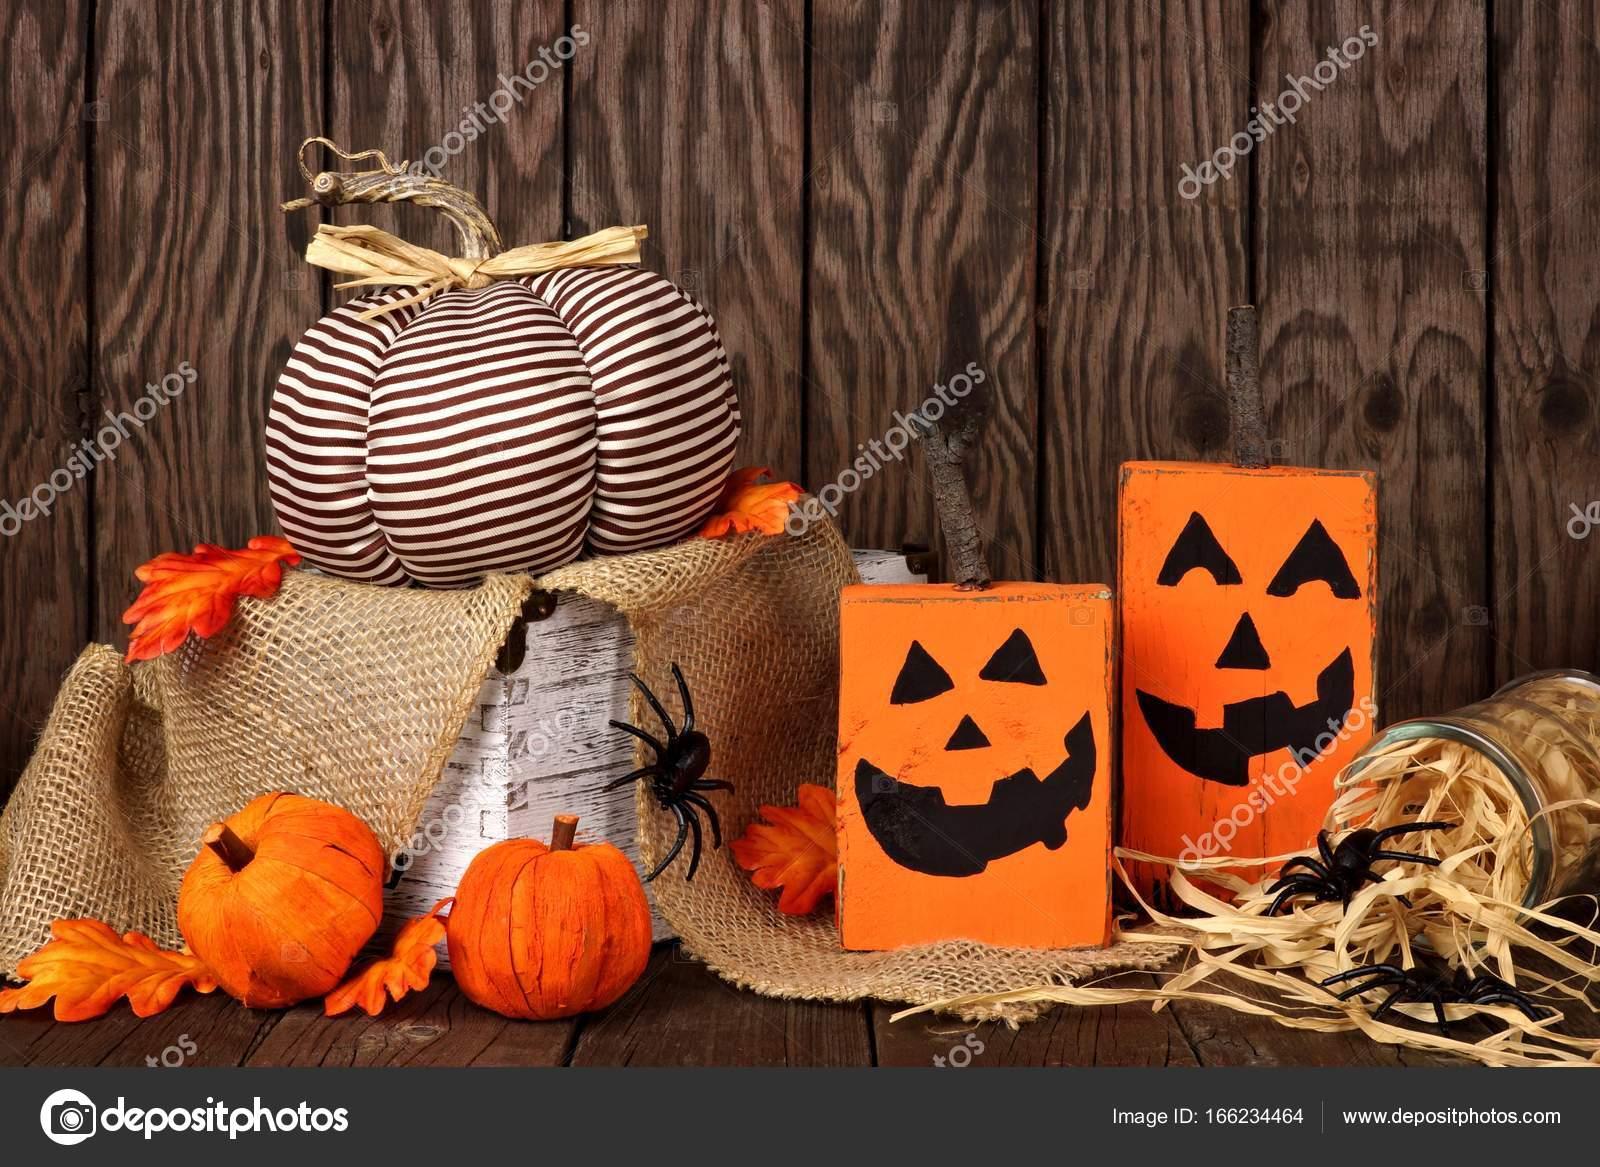 r stica cena shabby chic halloween decora o stock photo jenifoto 166234464. Black Bedroom Furniture Sets. Home Design Ideas